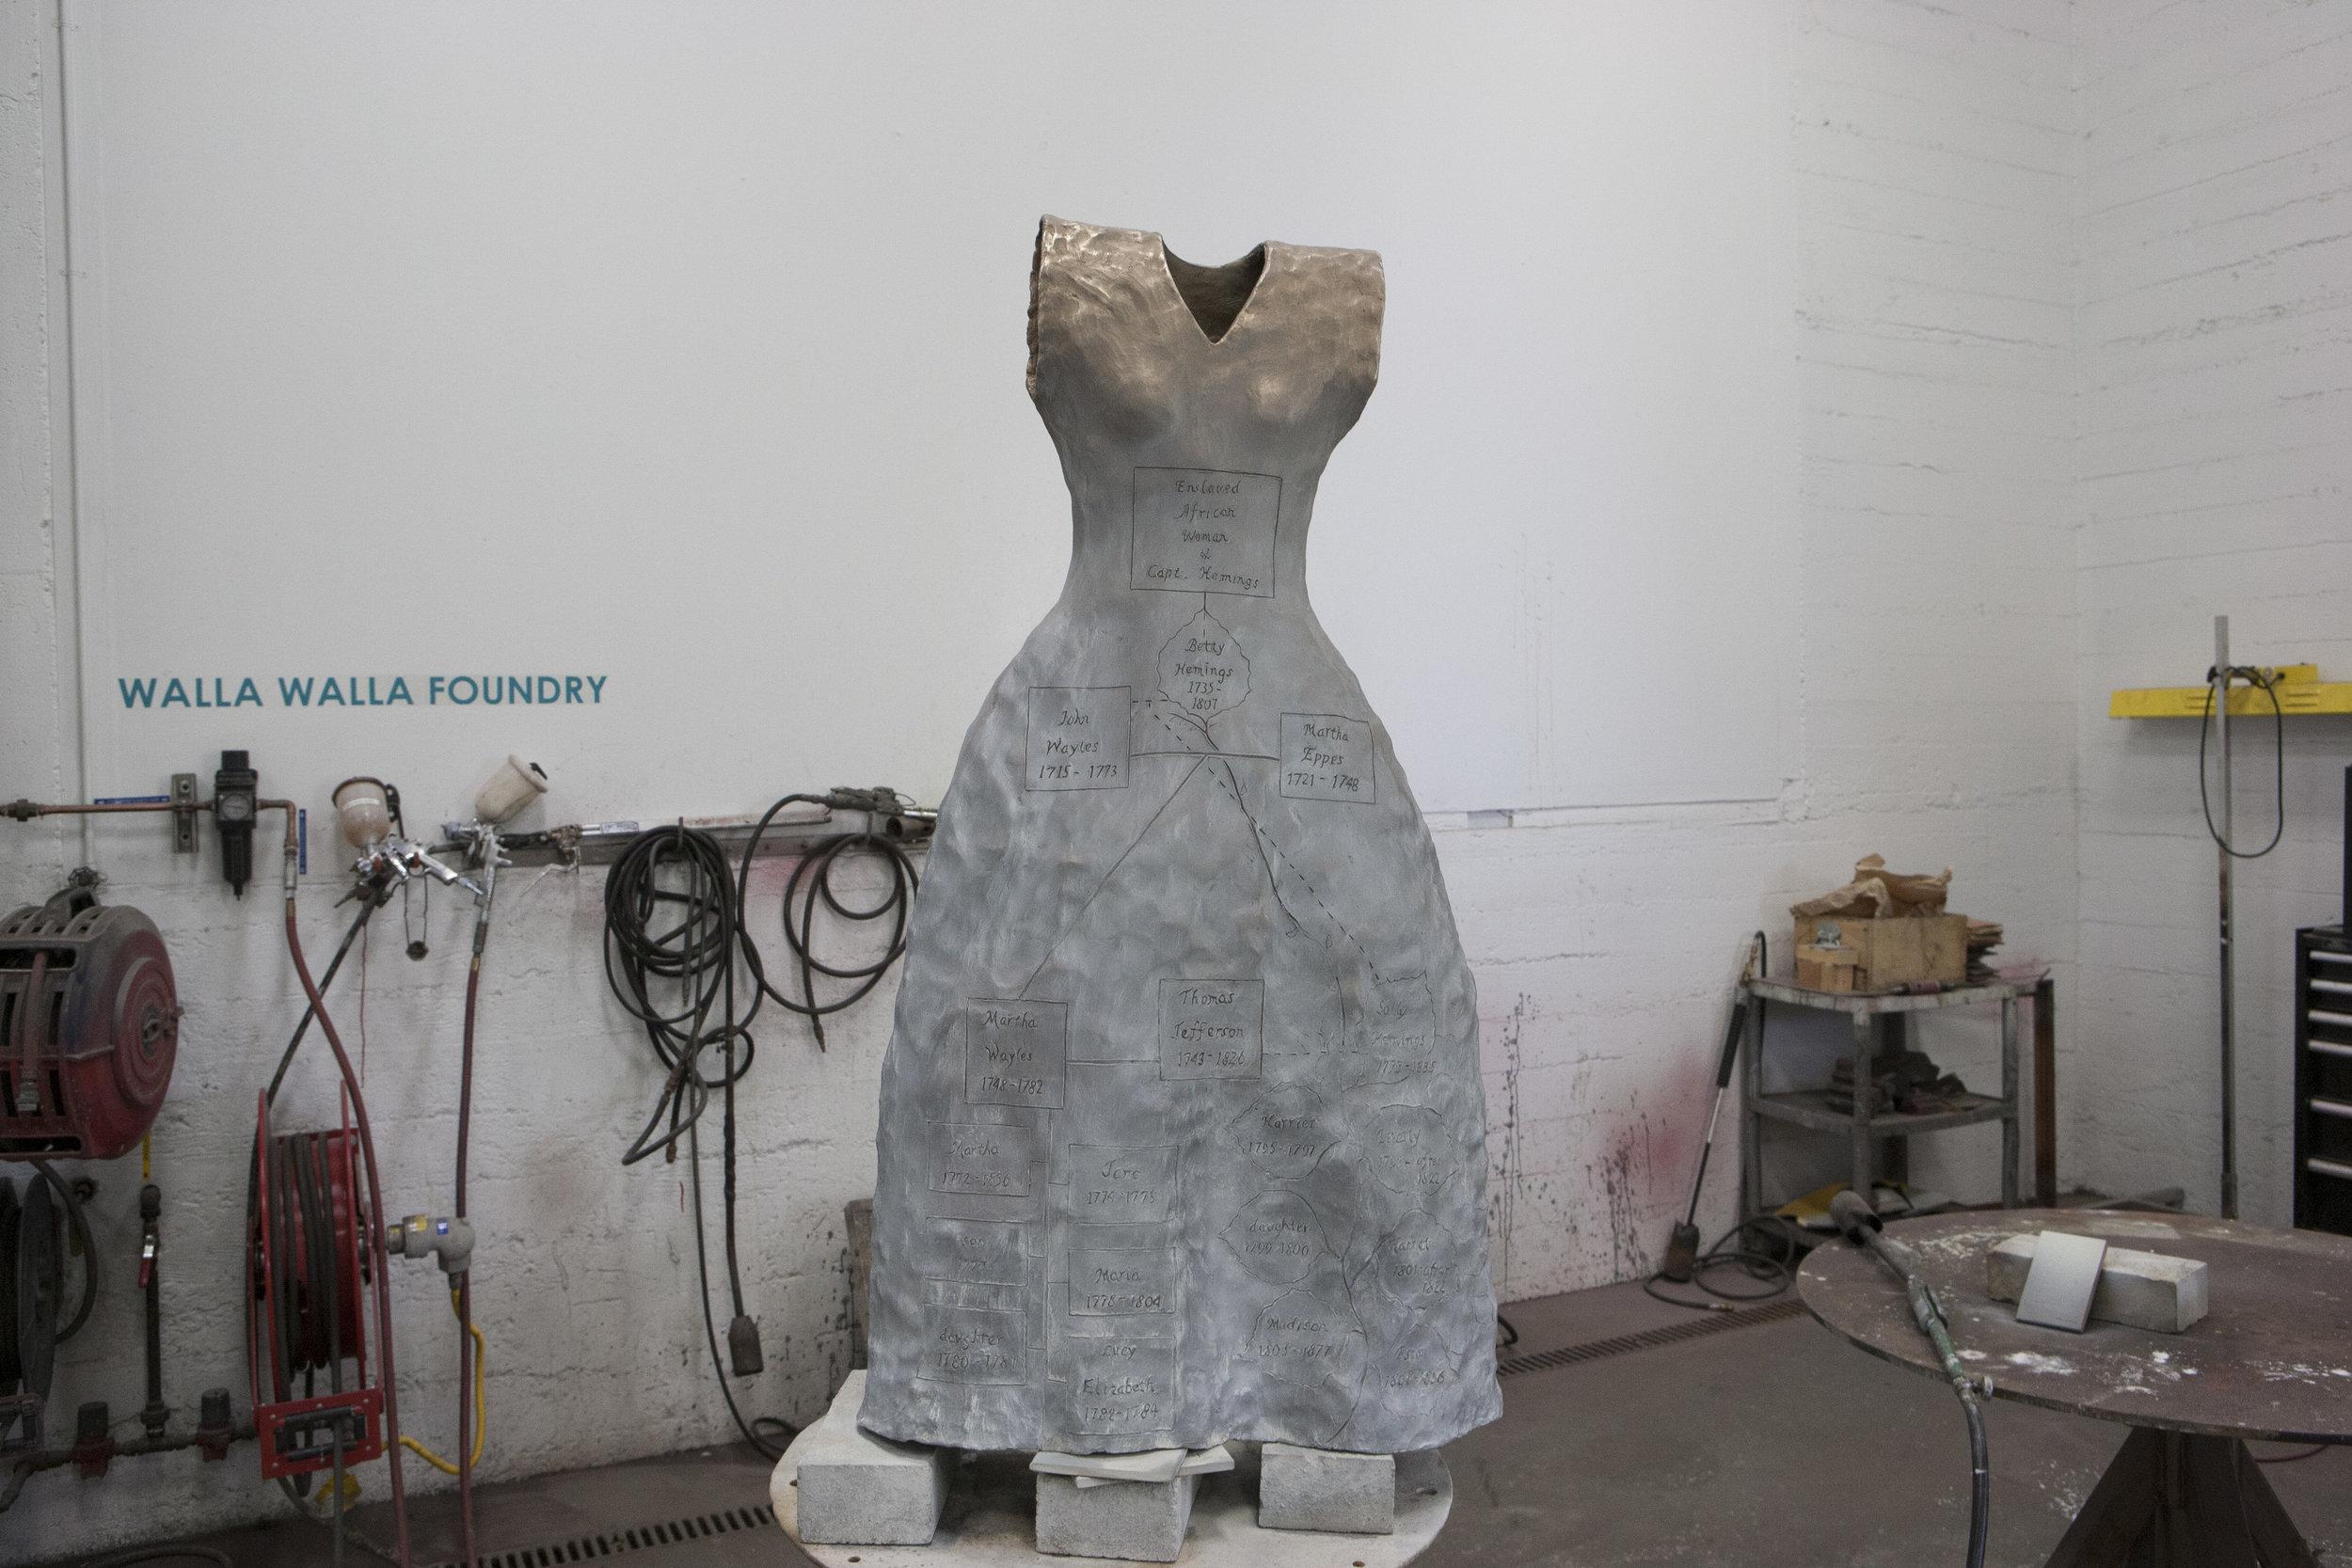 "Self Evident (For Sally Hemings)  Walla Walla Foundry, 2015, bronze, ferric nitrate, acrylic, wax; 40 ½ x 20"" x 10."""